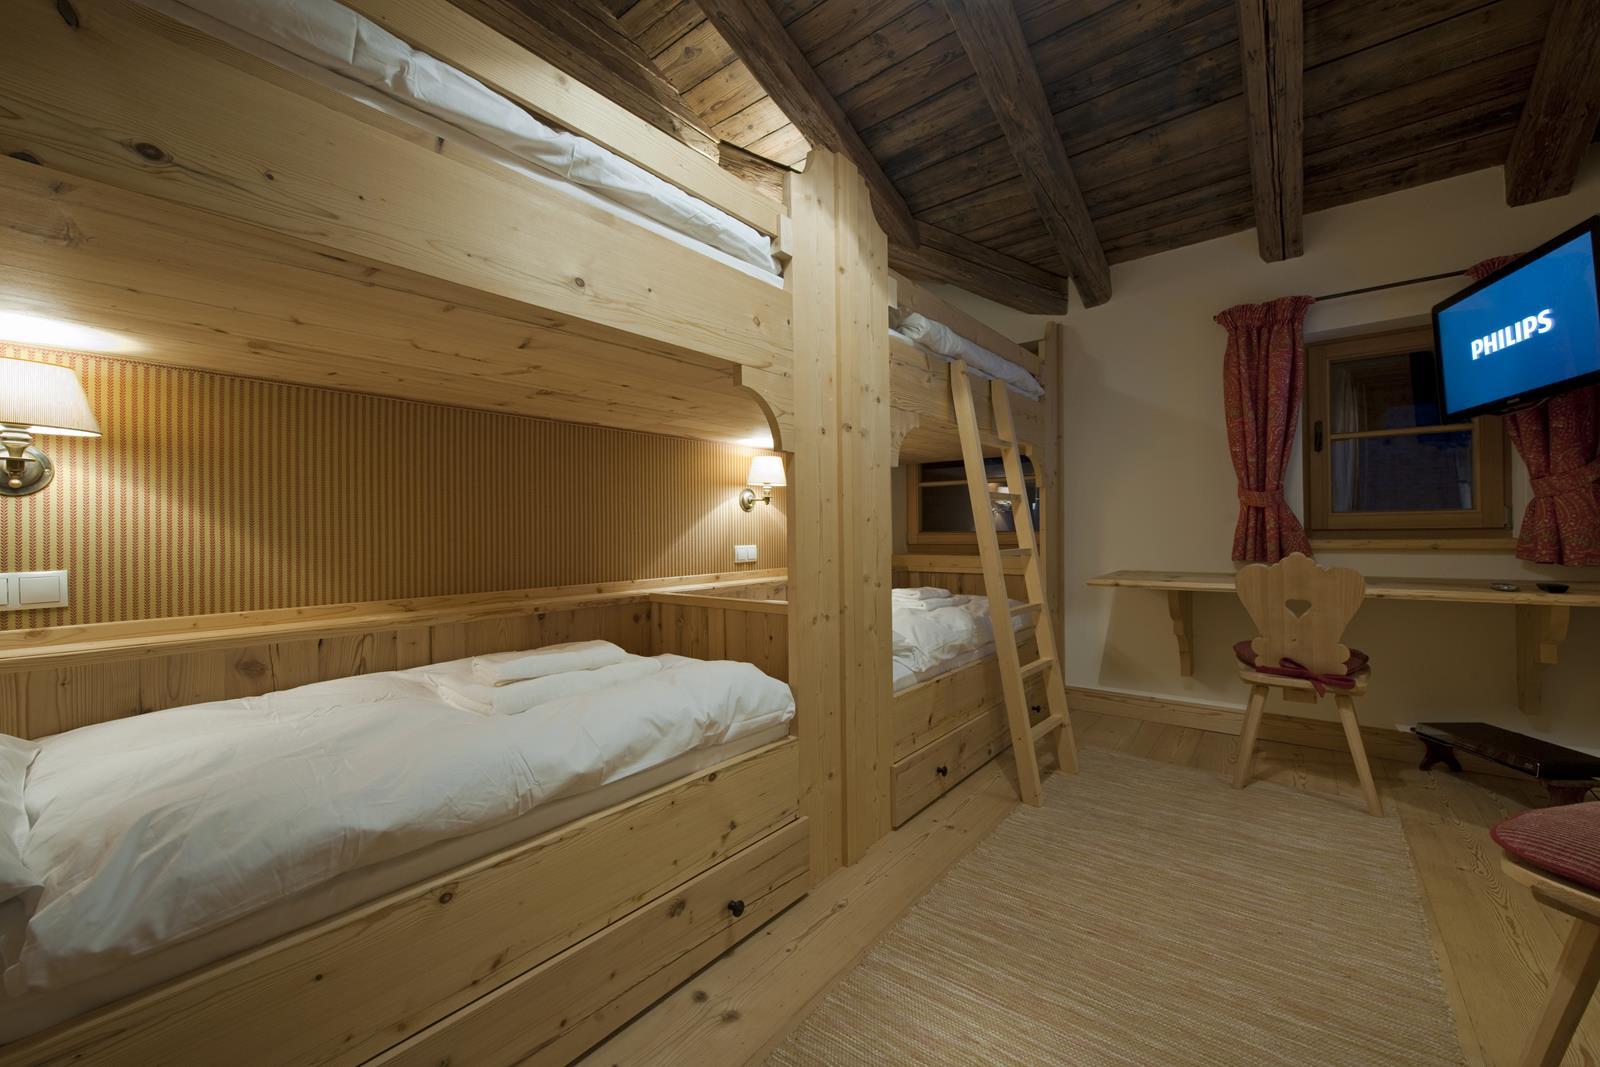 chalet-antoinette-bunk-room-2